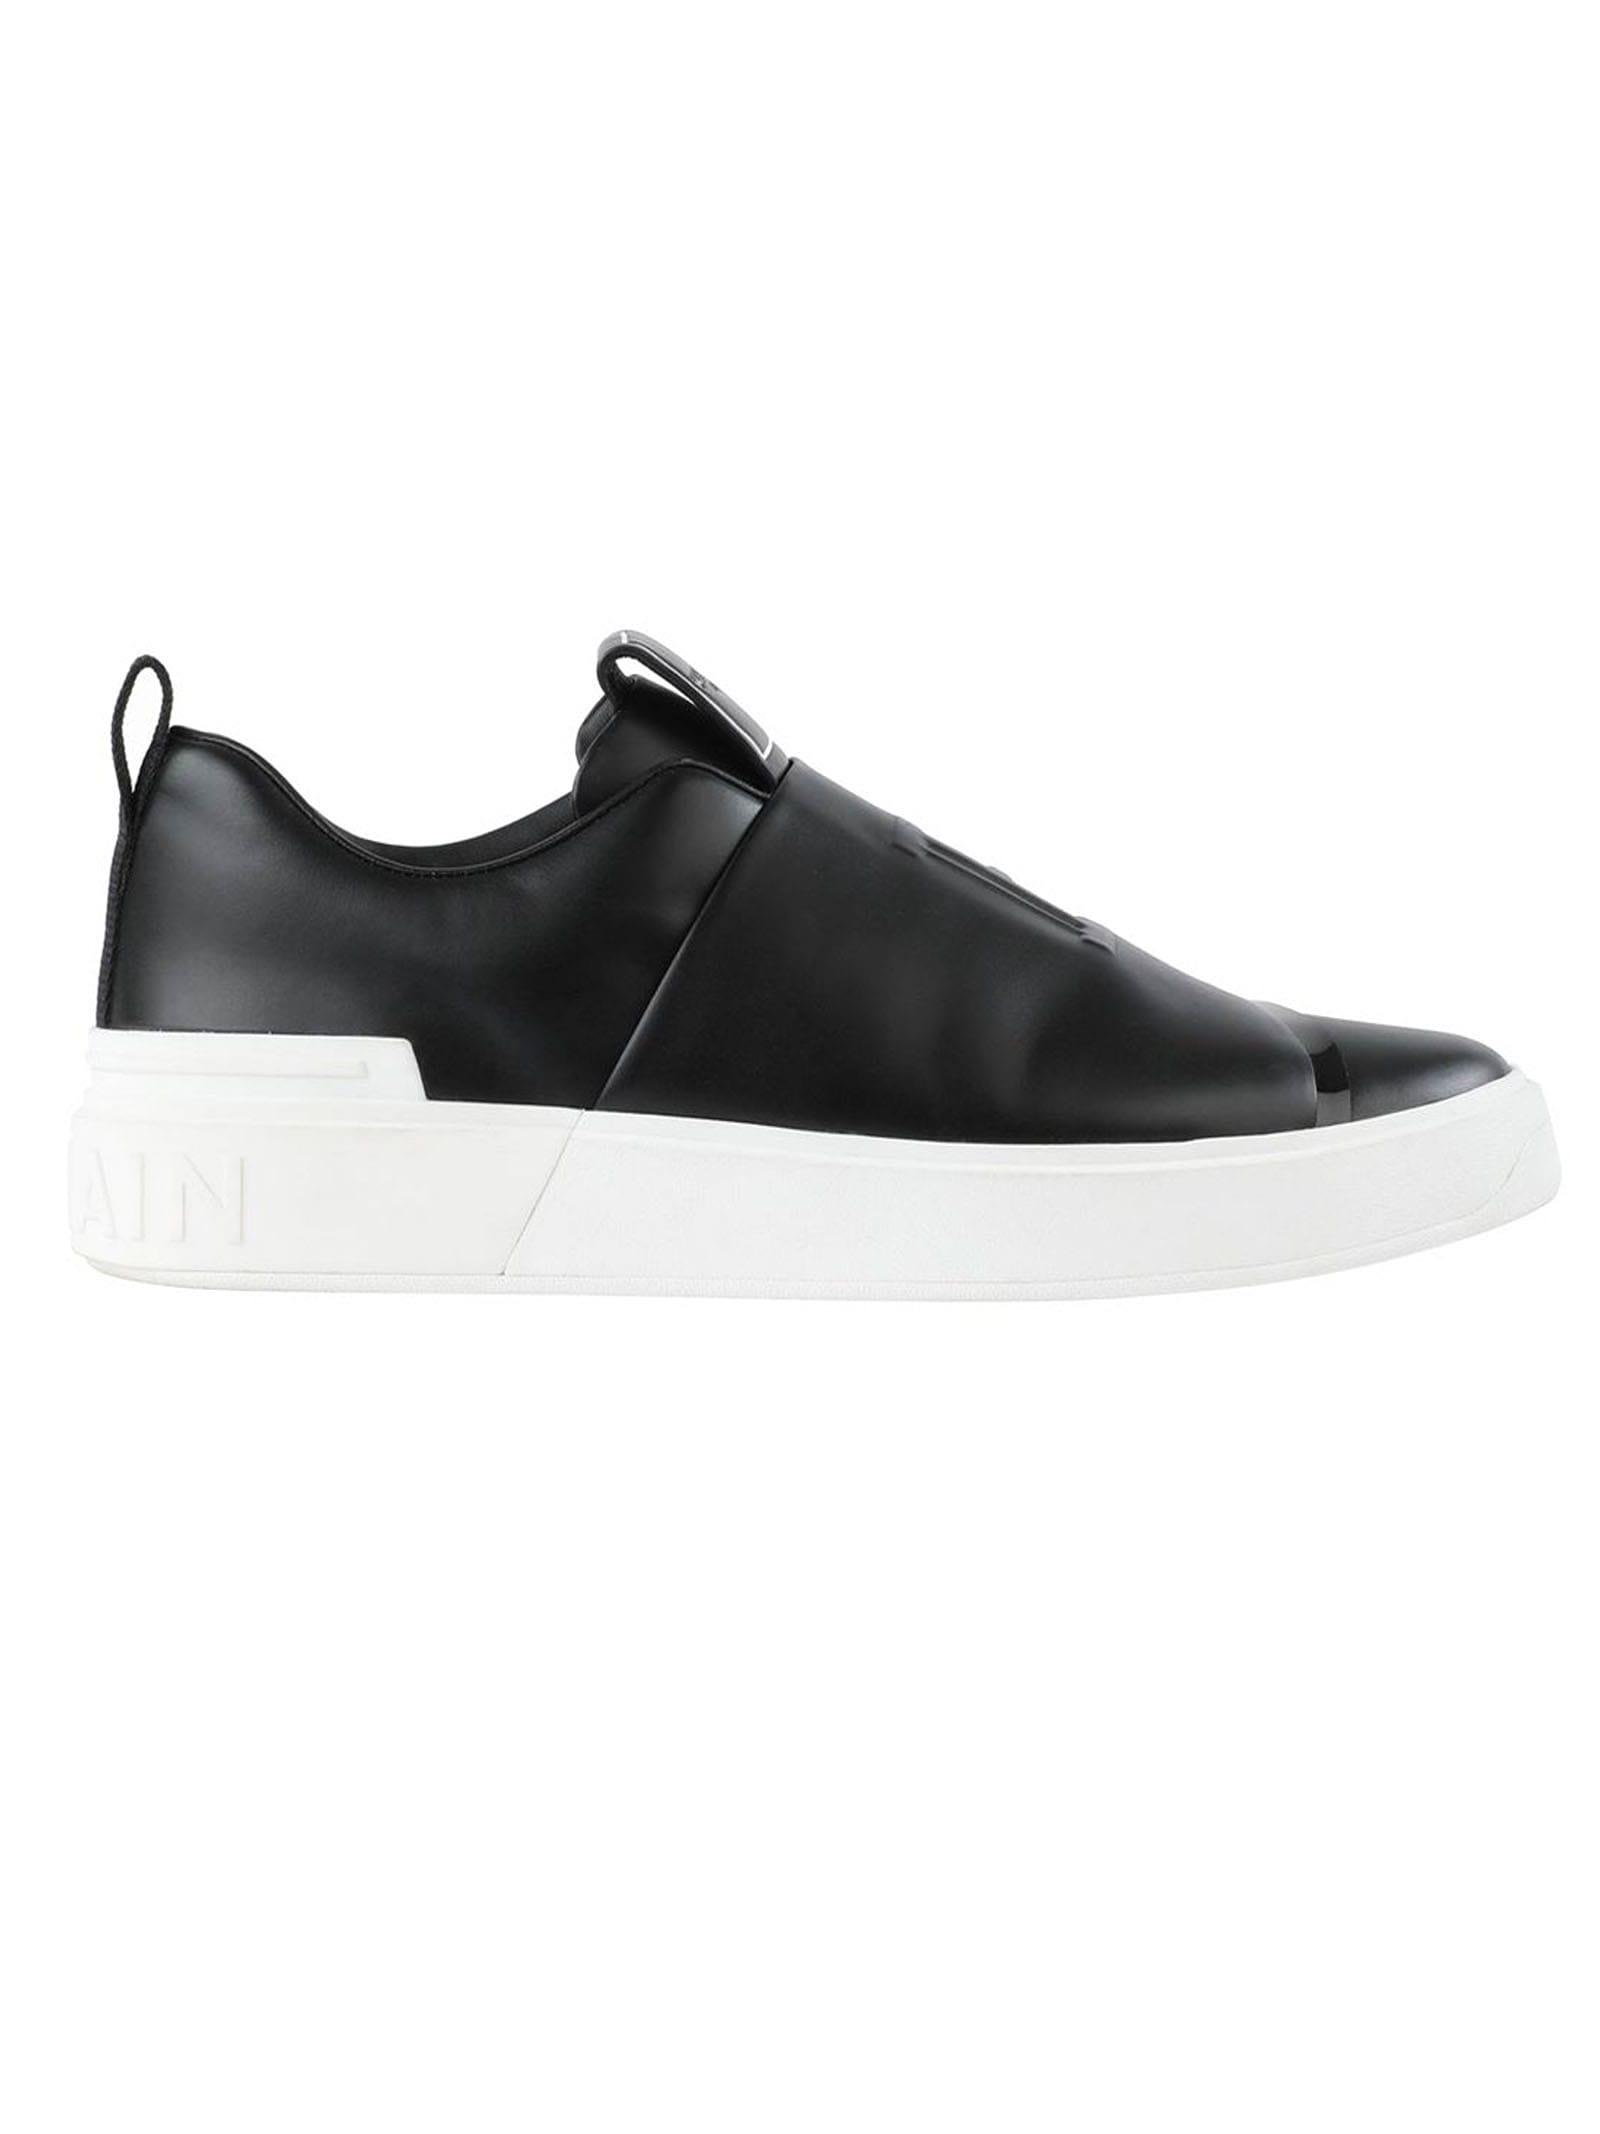 Balmain B-court Easy Sneakers